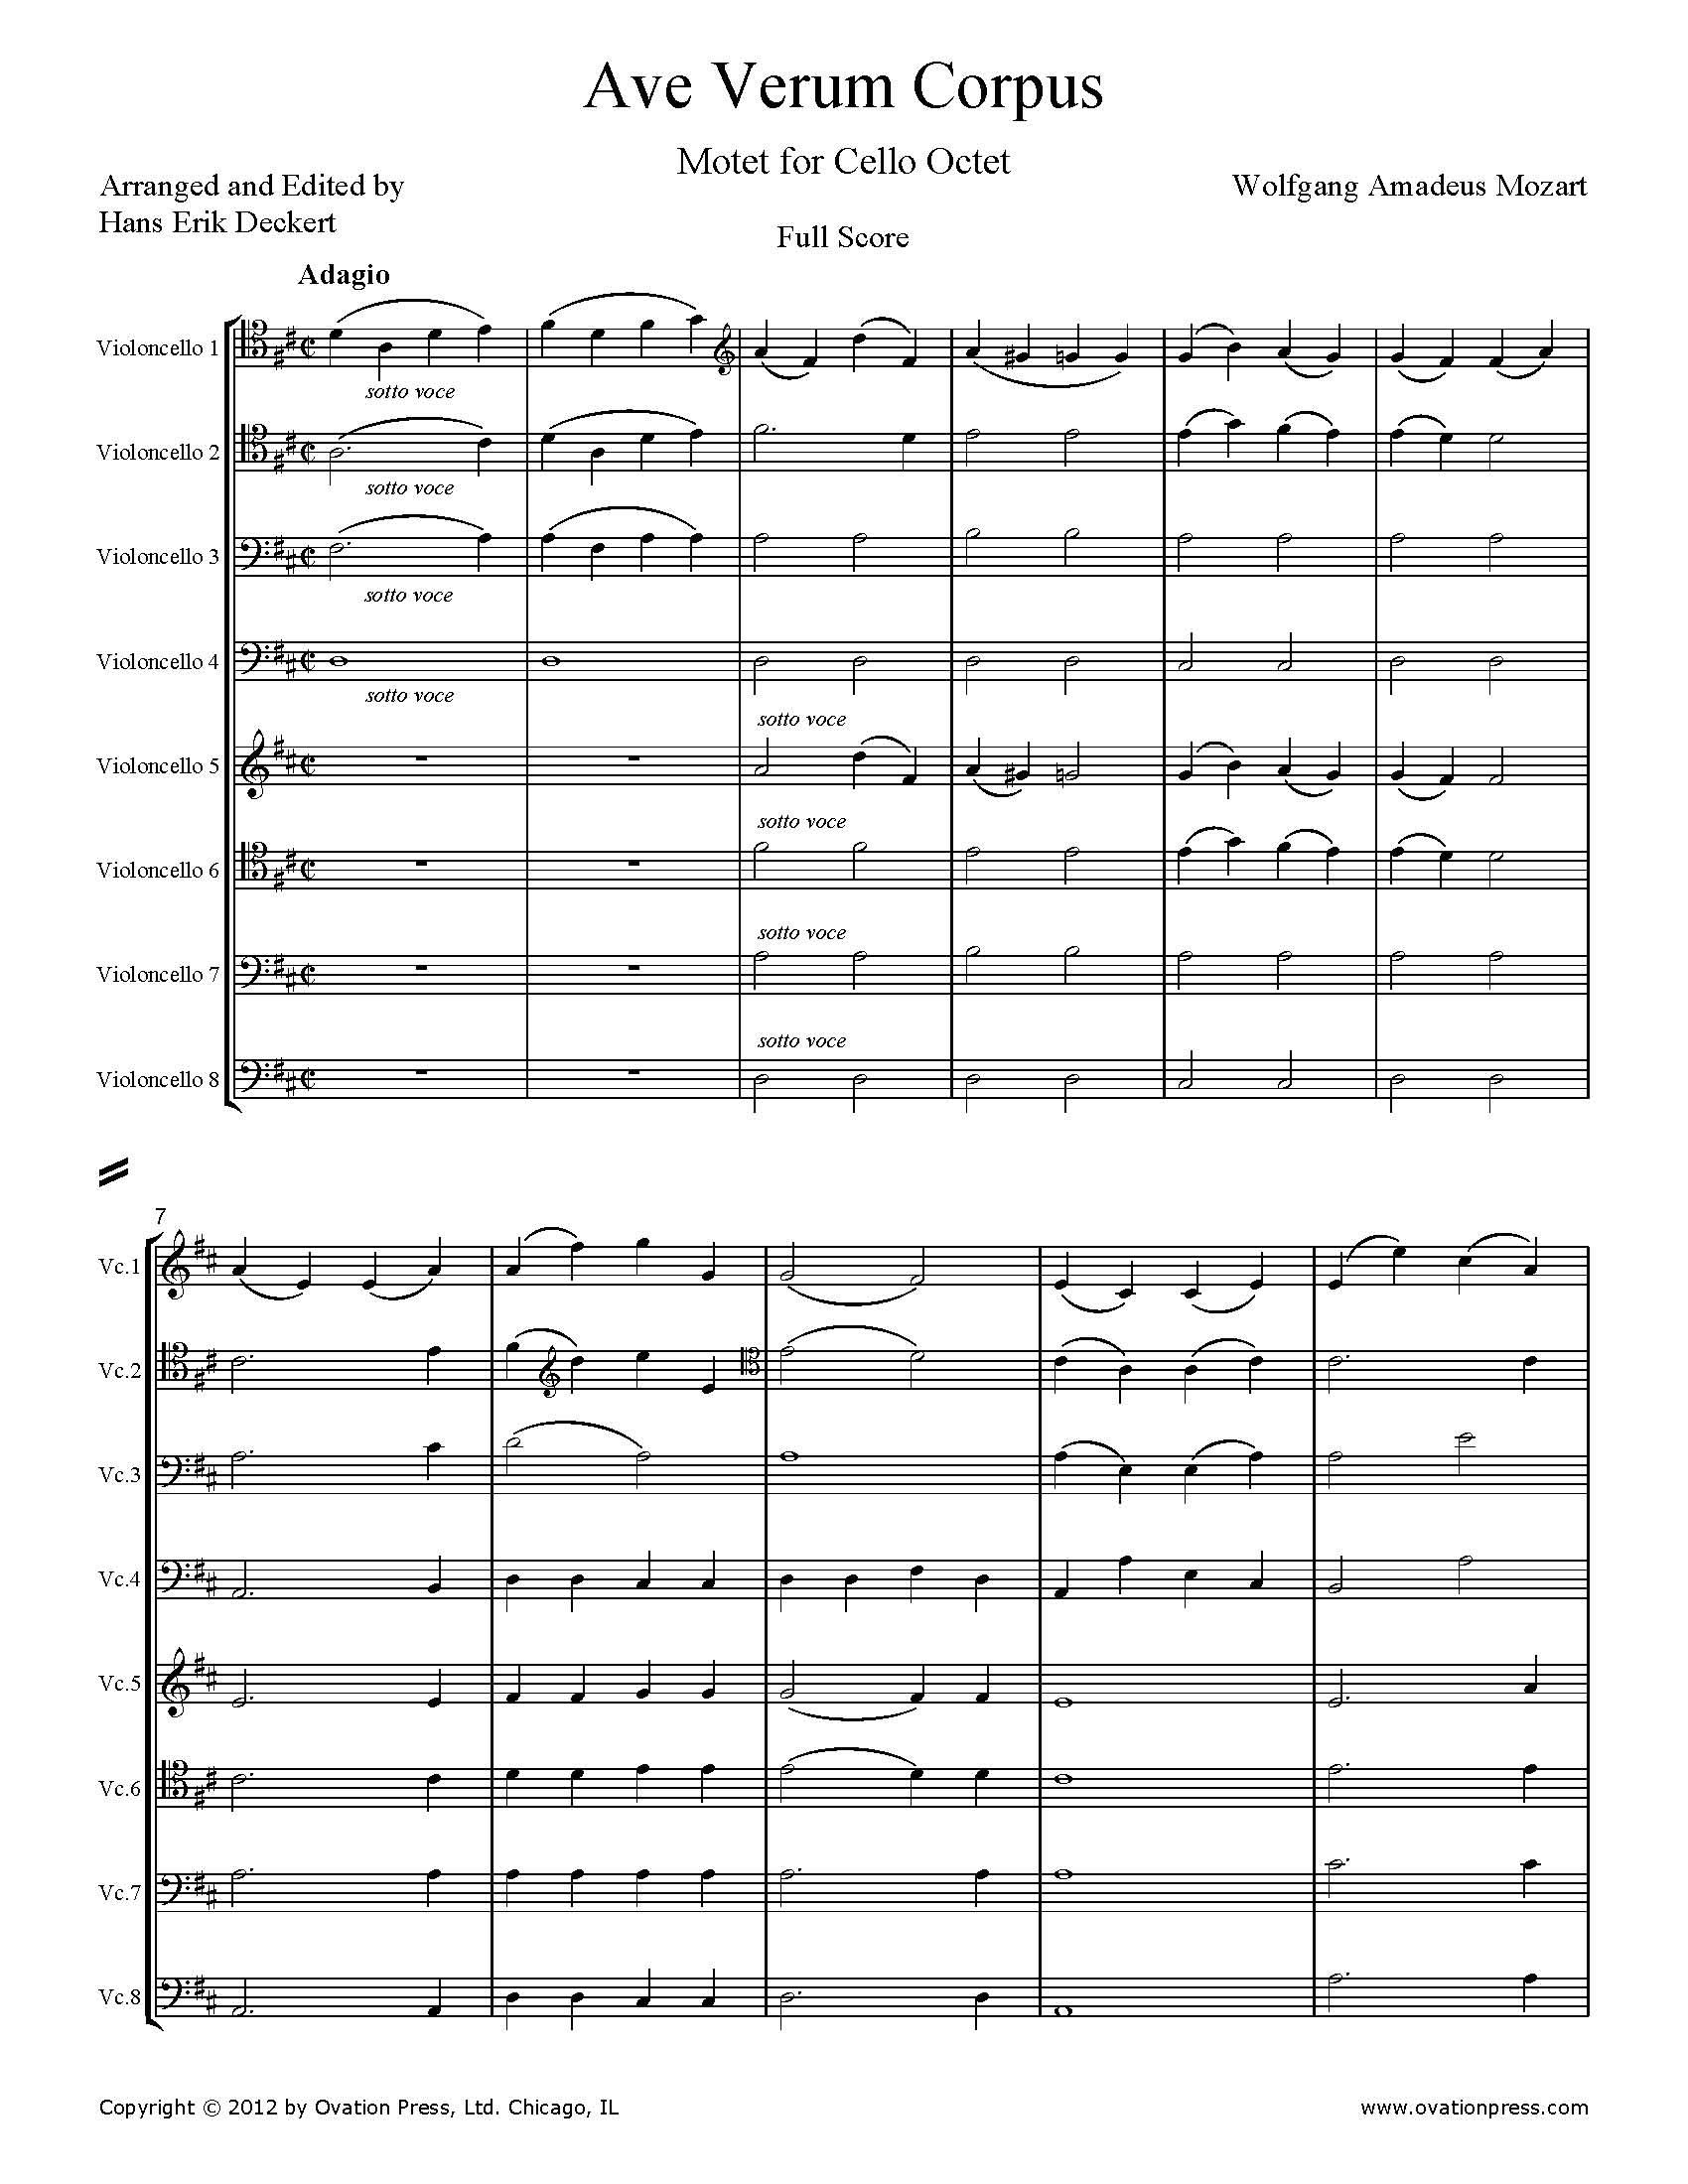 Mozart Ave Verum Corpus Arranged For Cello Octet